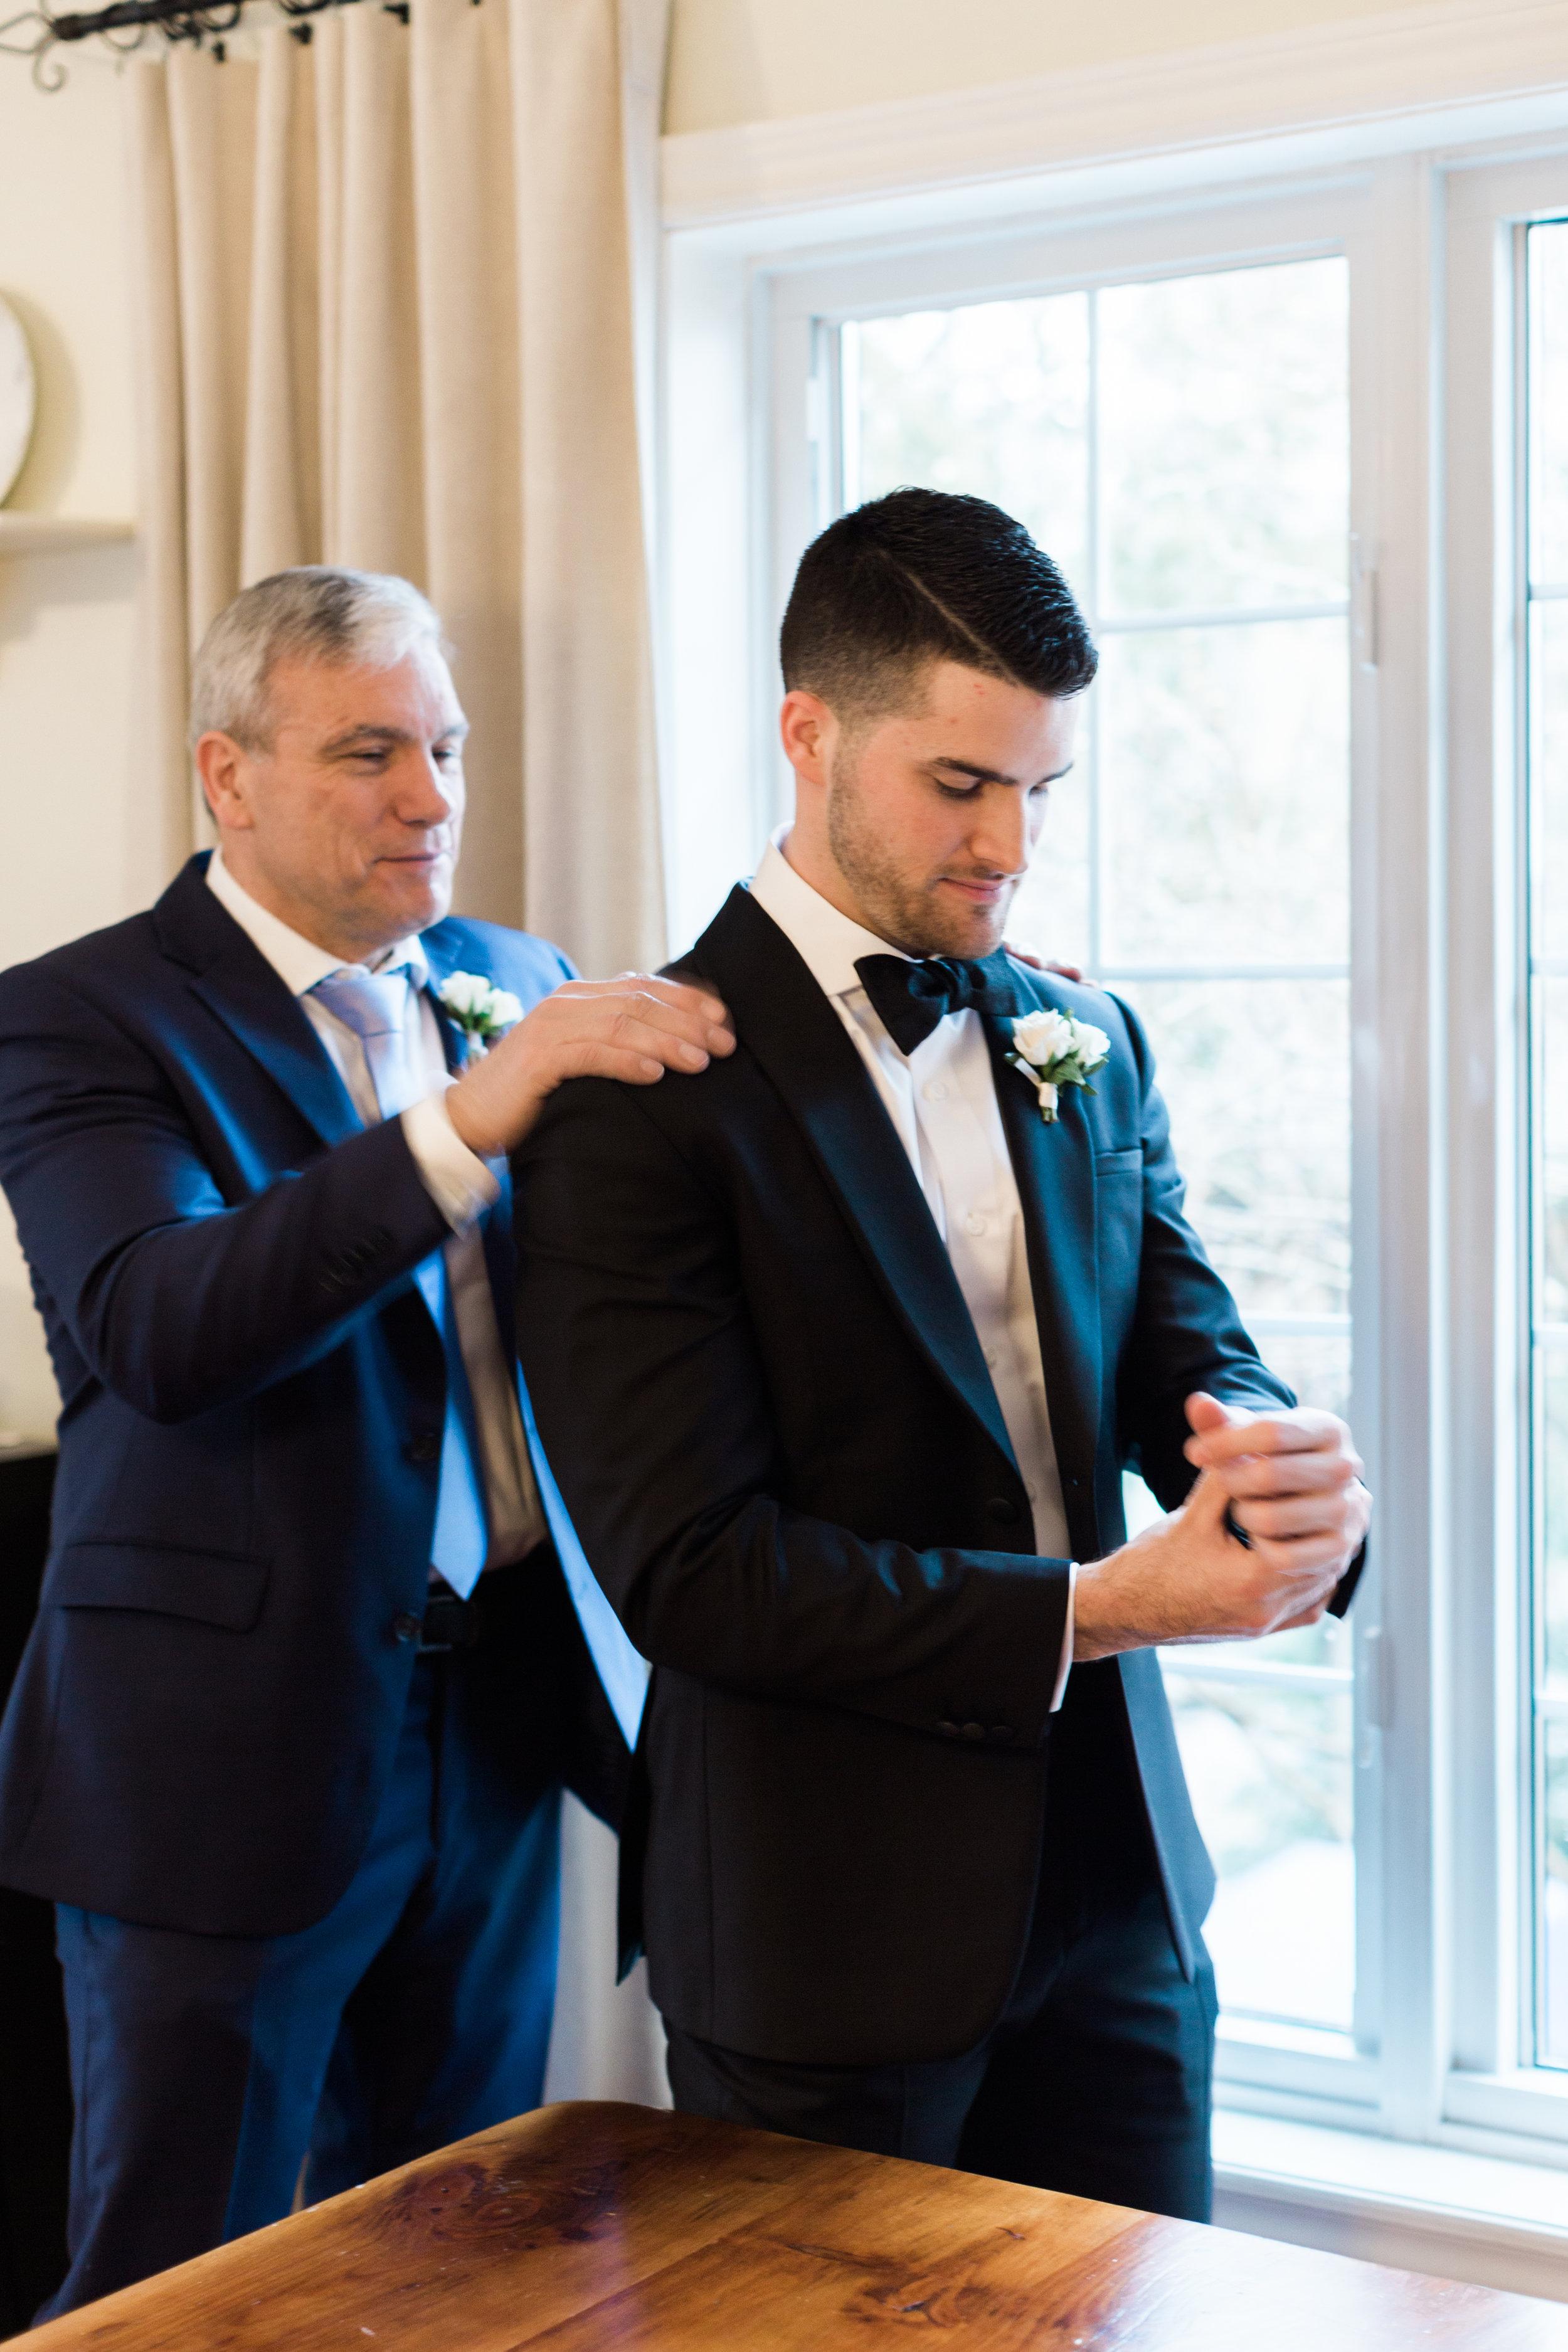 The Manor Winter Wedding - Groom Getting Ready-10.jpg